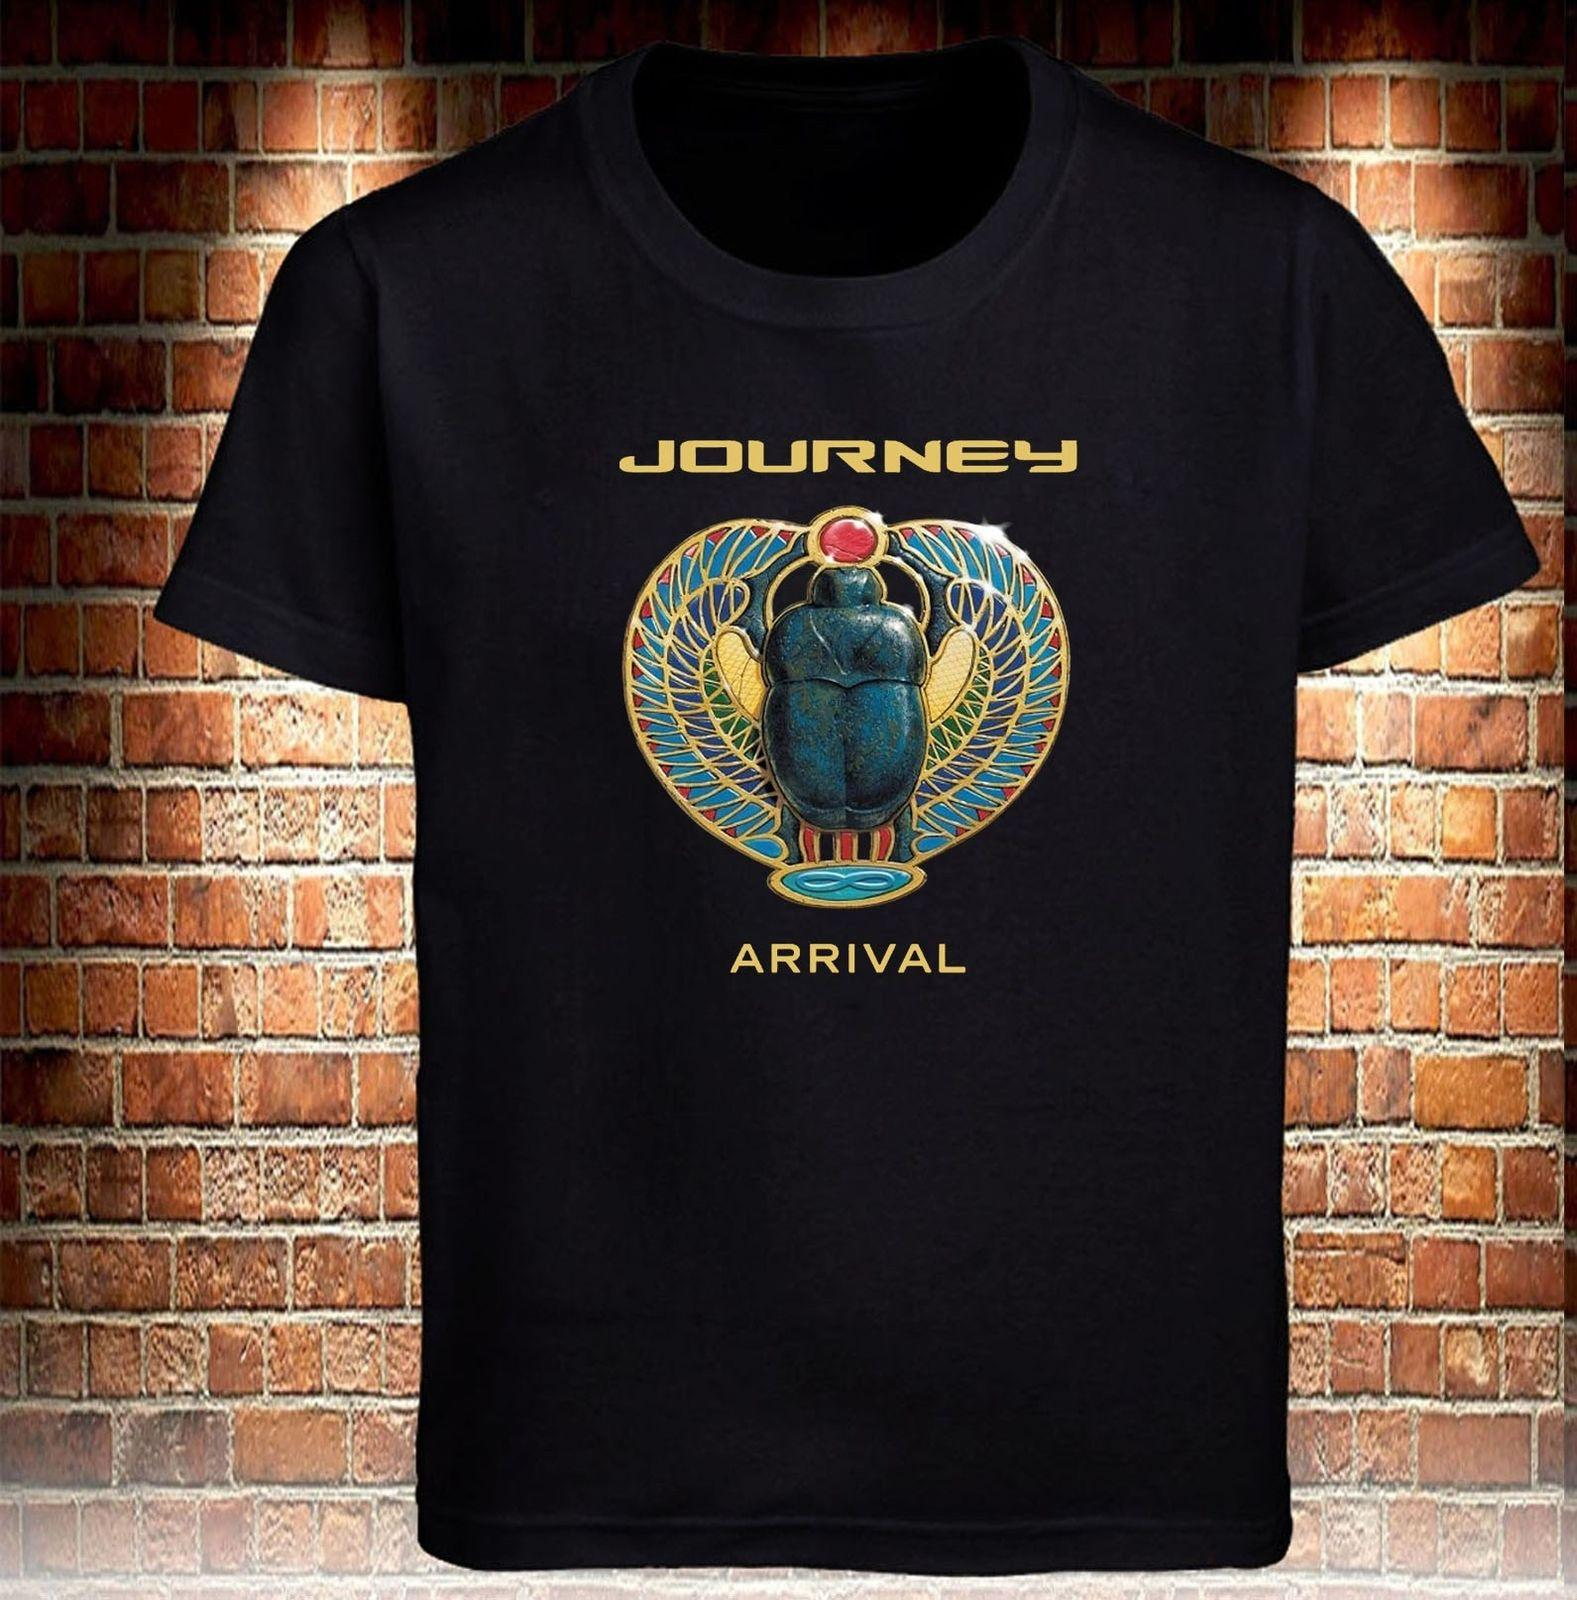 9e80c7b56 Black T-shirt Journey Band Arrival Logo Grey Tee Men's Tee S - 3xl Cartoon T  Shirt Men Unisex New Fashion Tshirt Free Shipping